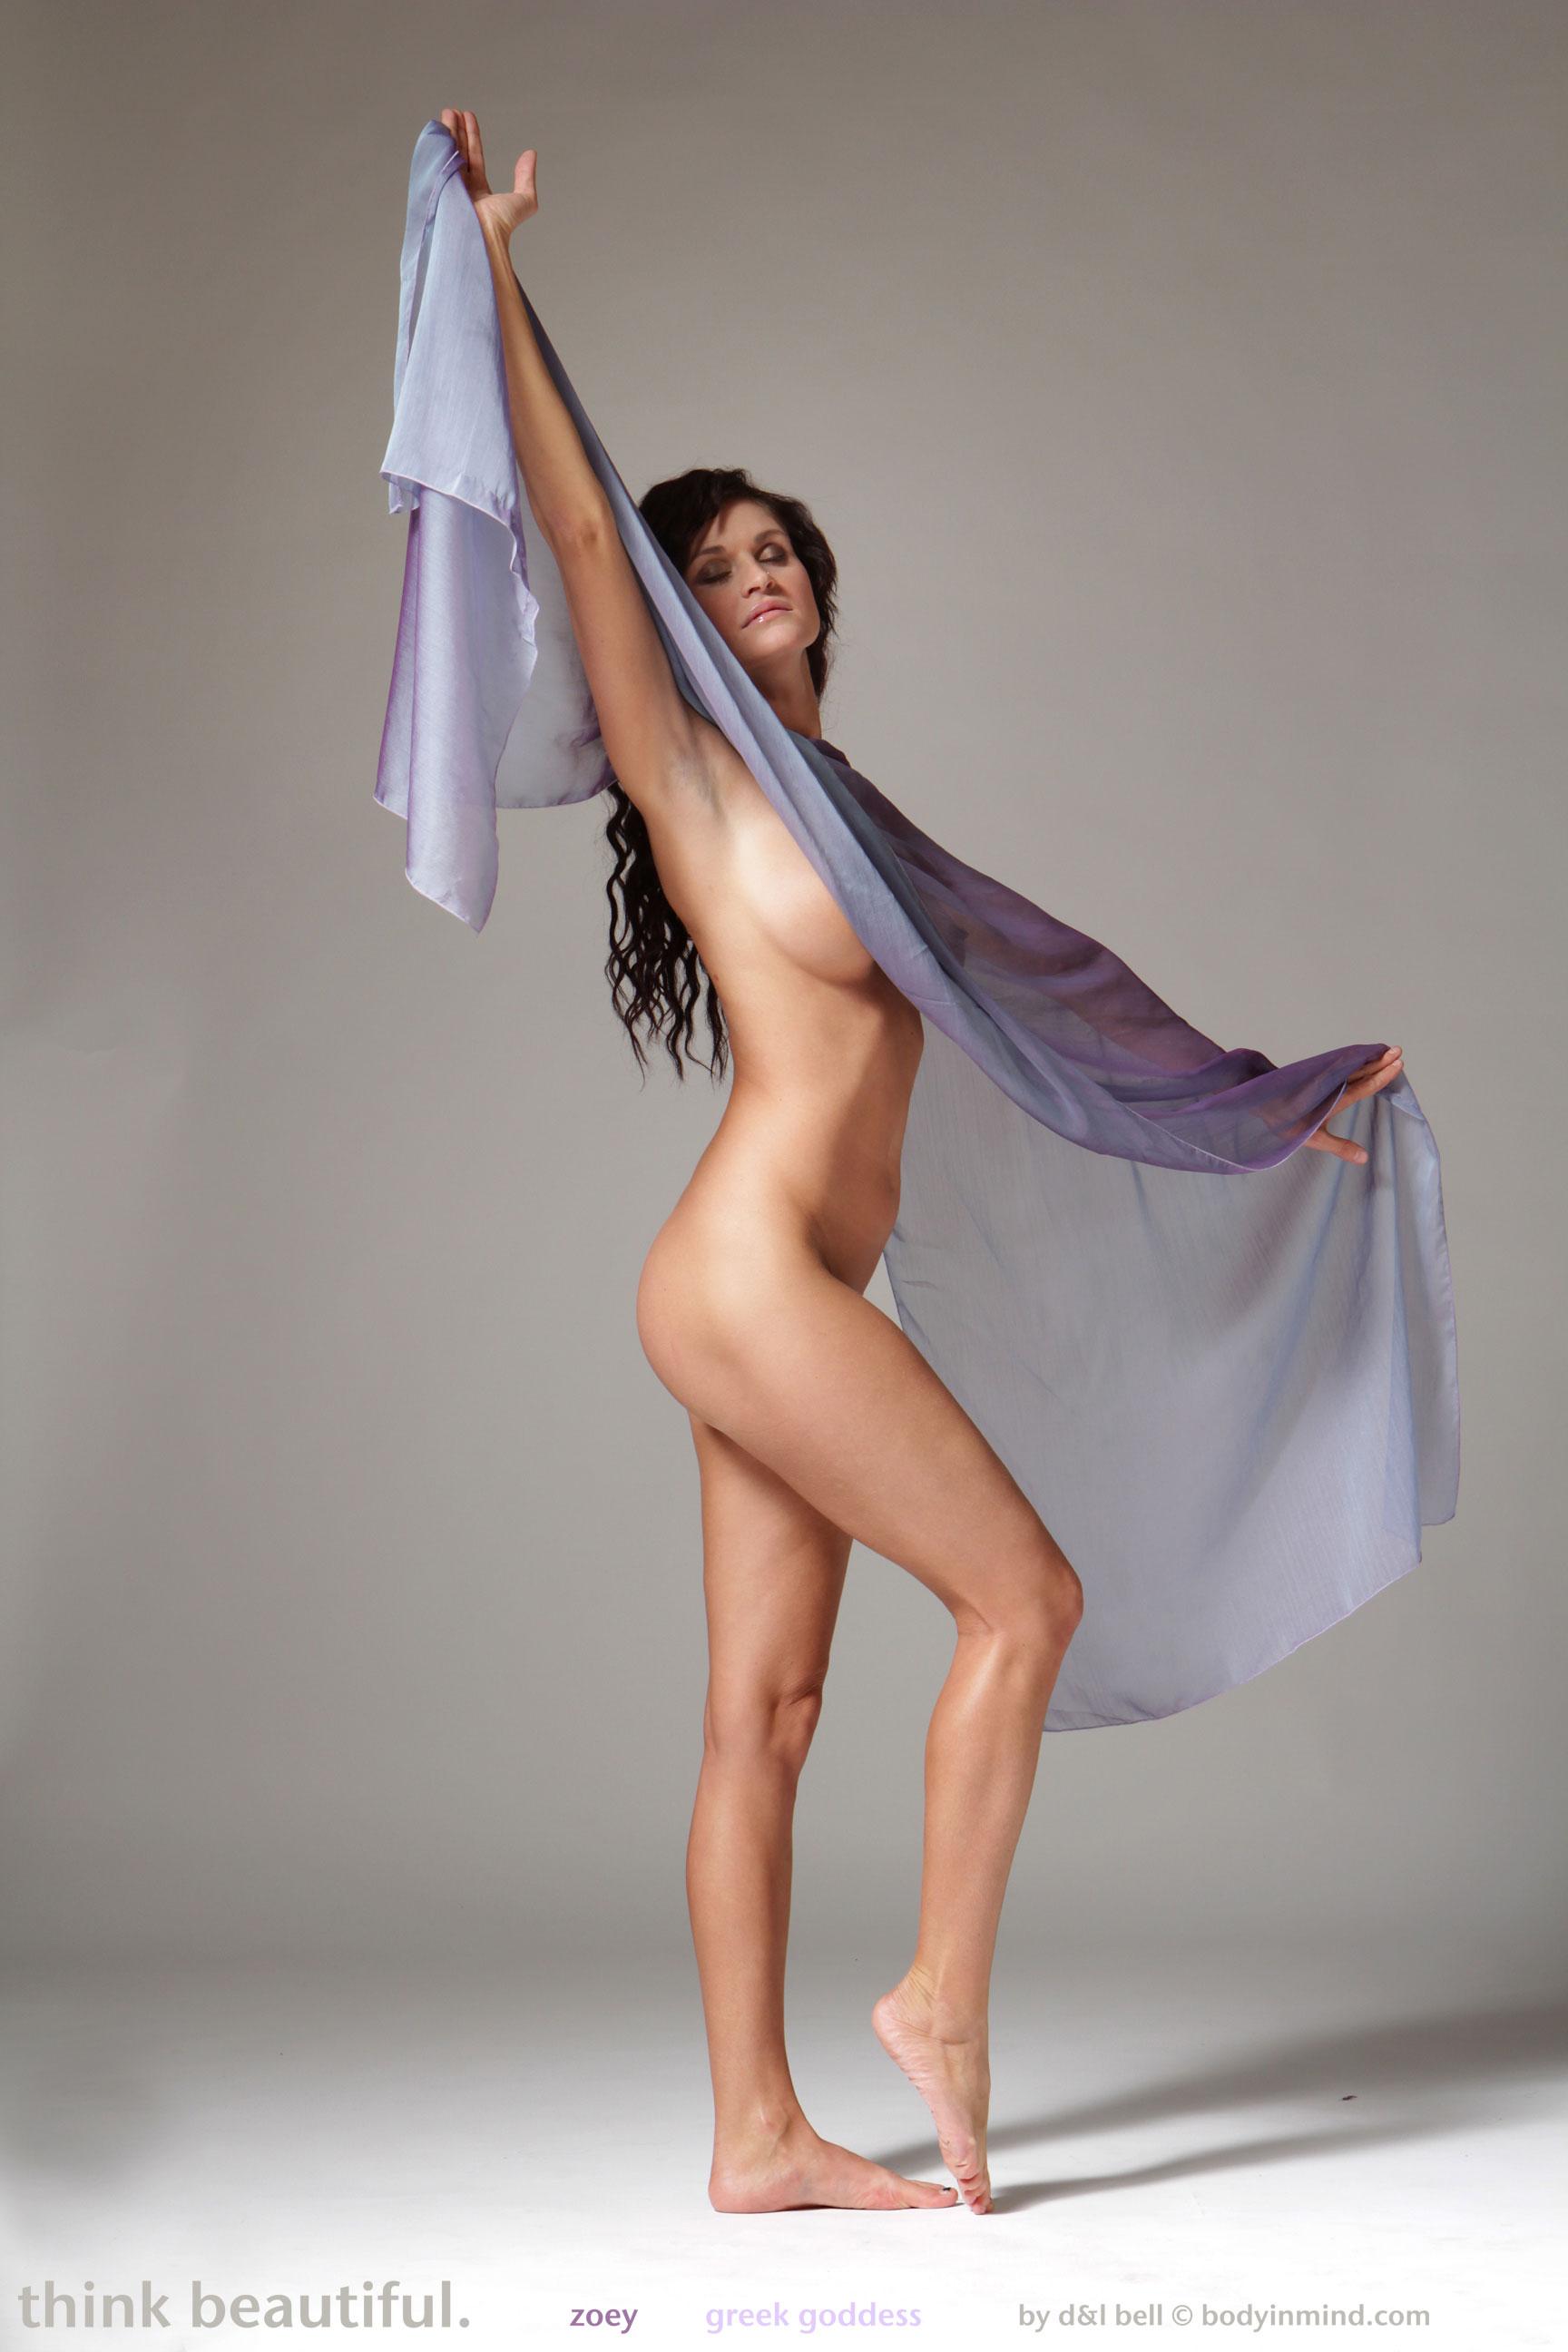 Zoey Goddess - NudesPuri.com